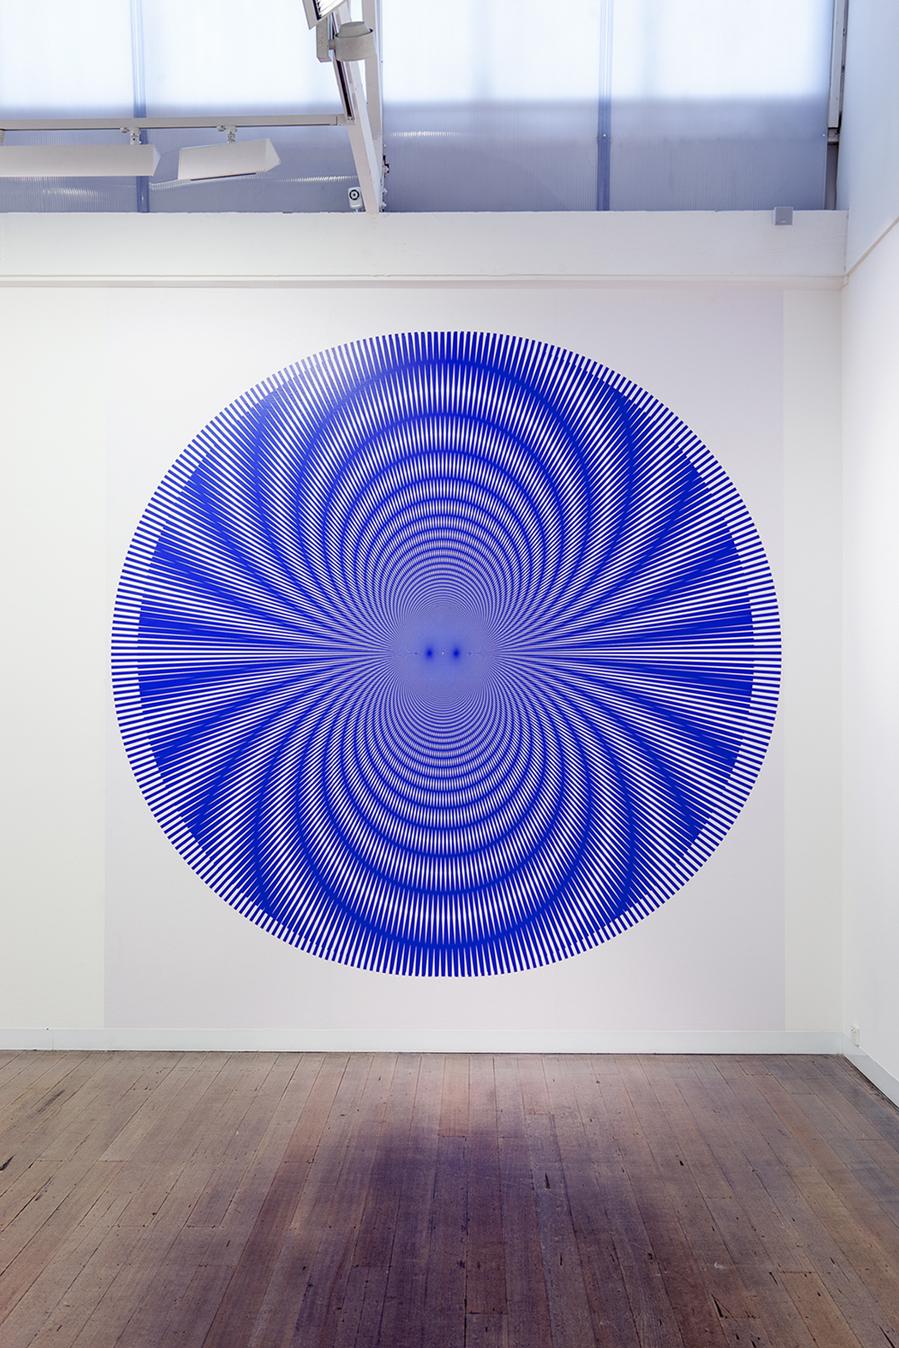 NIKE SAVVAS     Spark (2) (wallpaper)   Sparks  Exhibition View 2014 400 x 300 cm